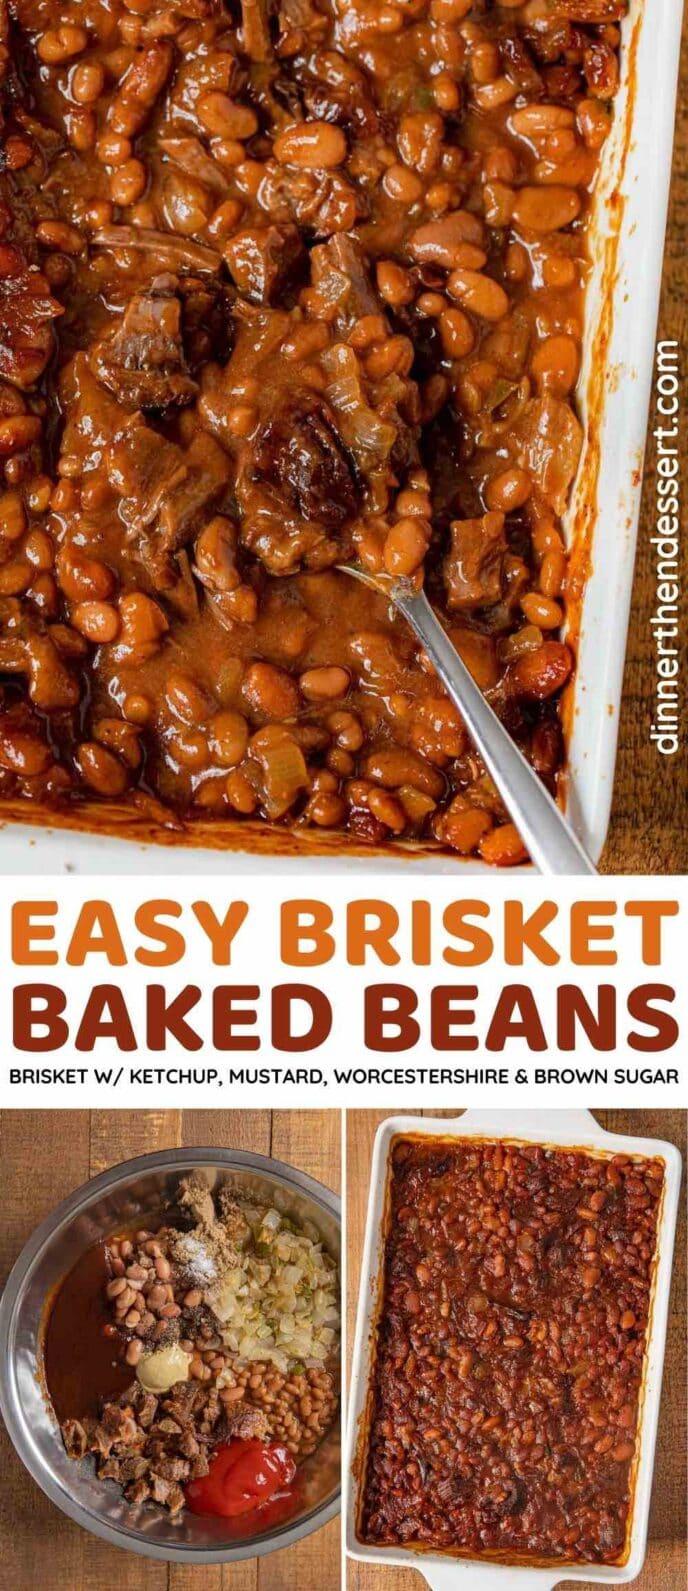 Brisket Baked Beans collage